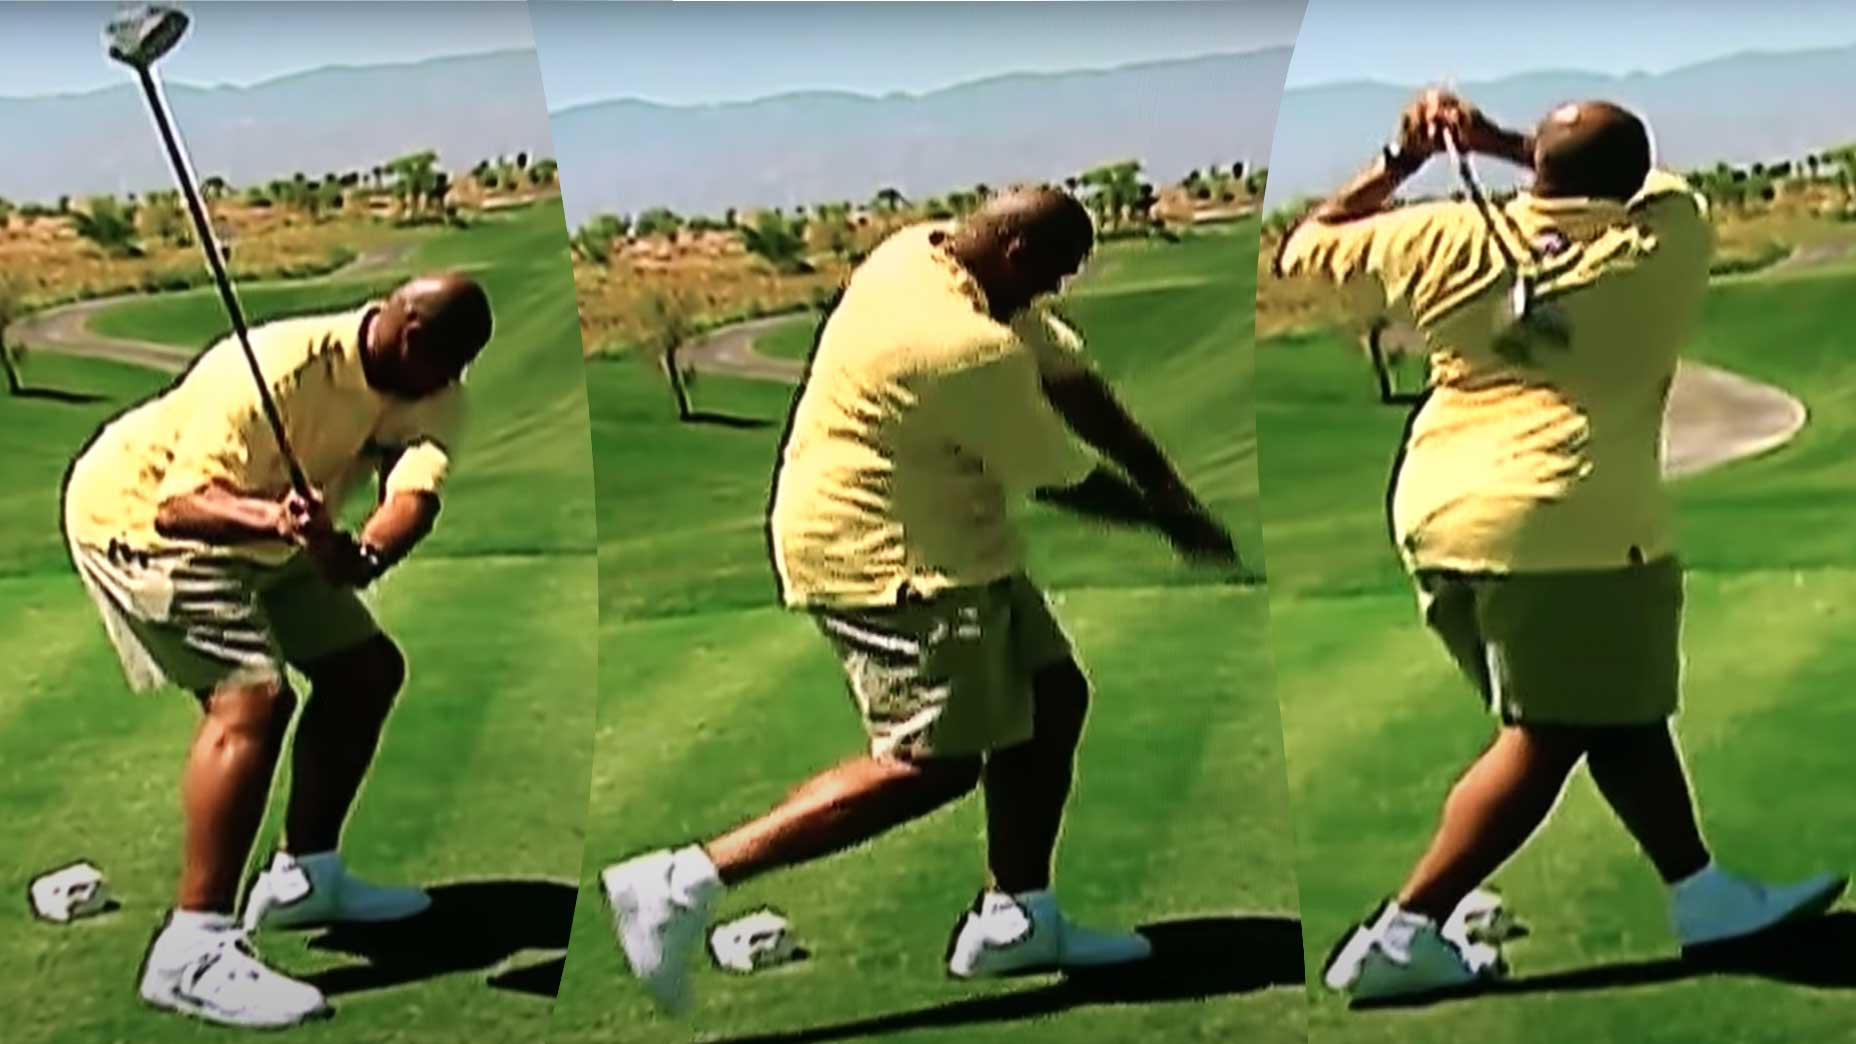 charles barkley's swing